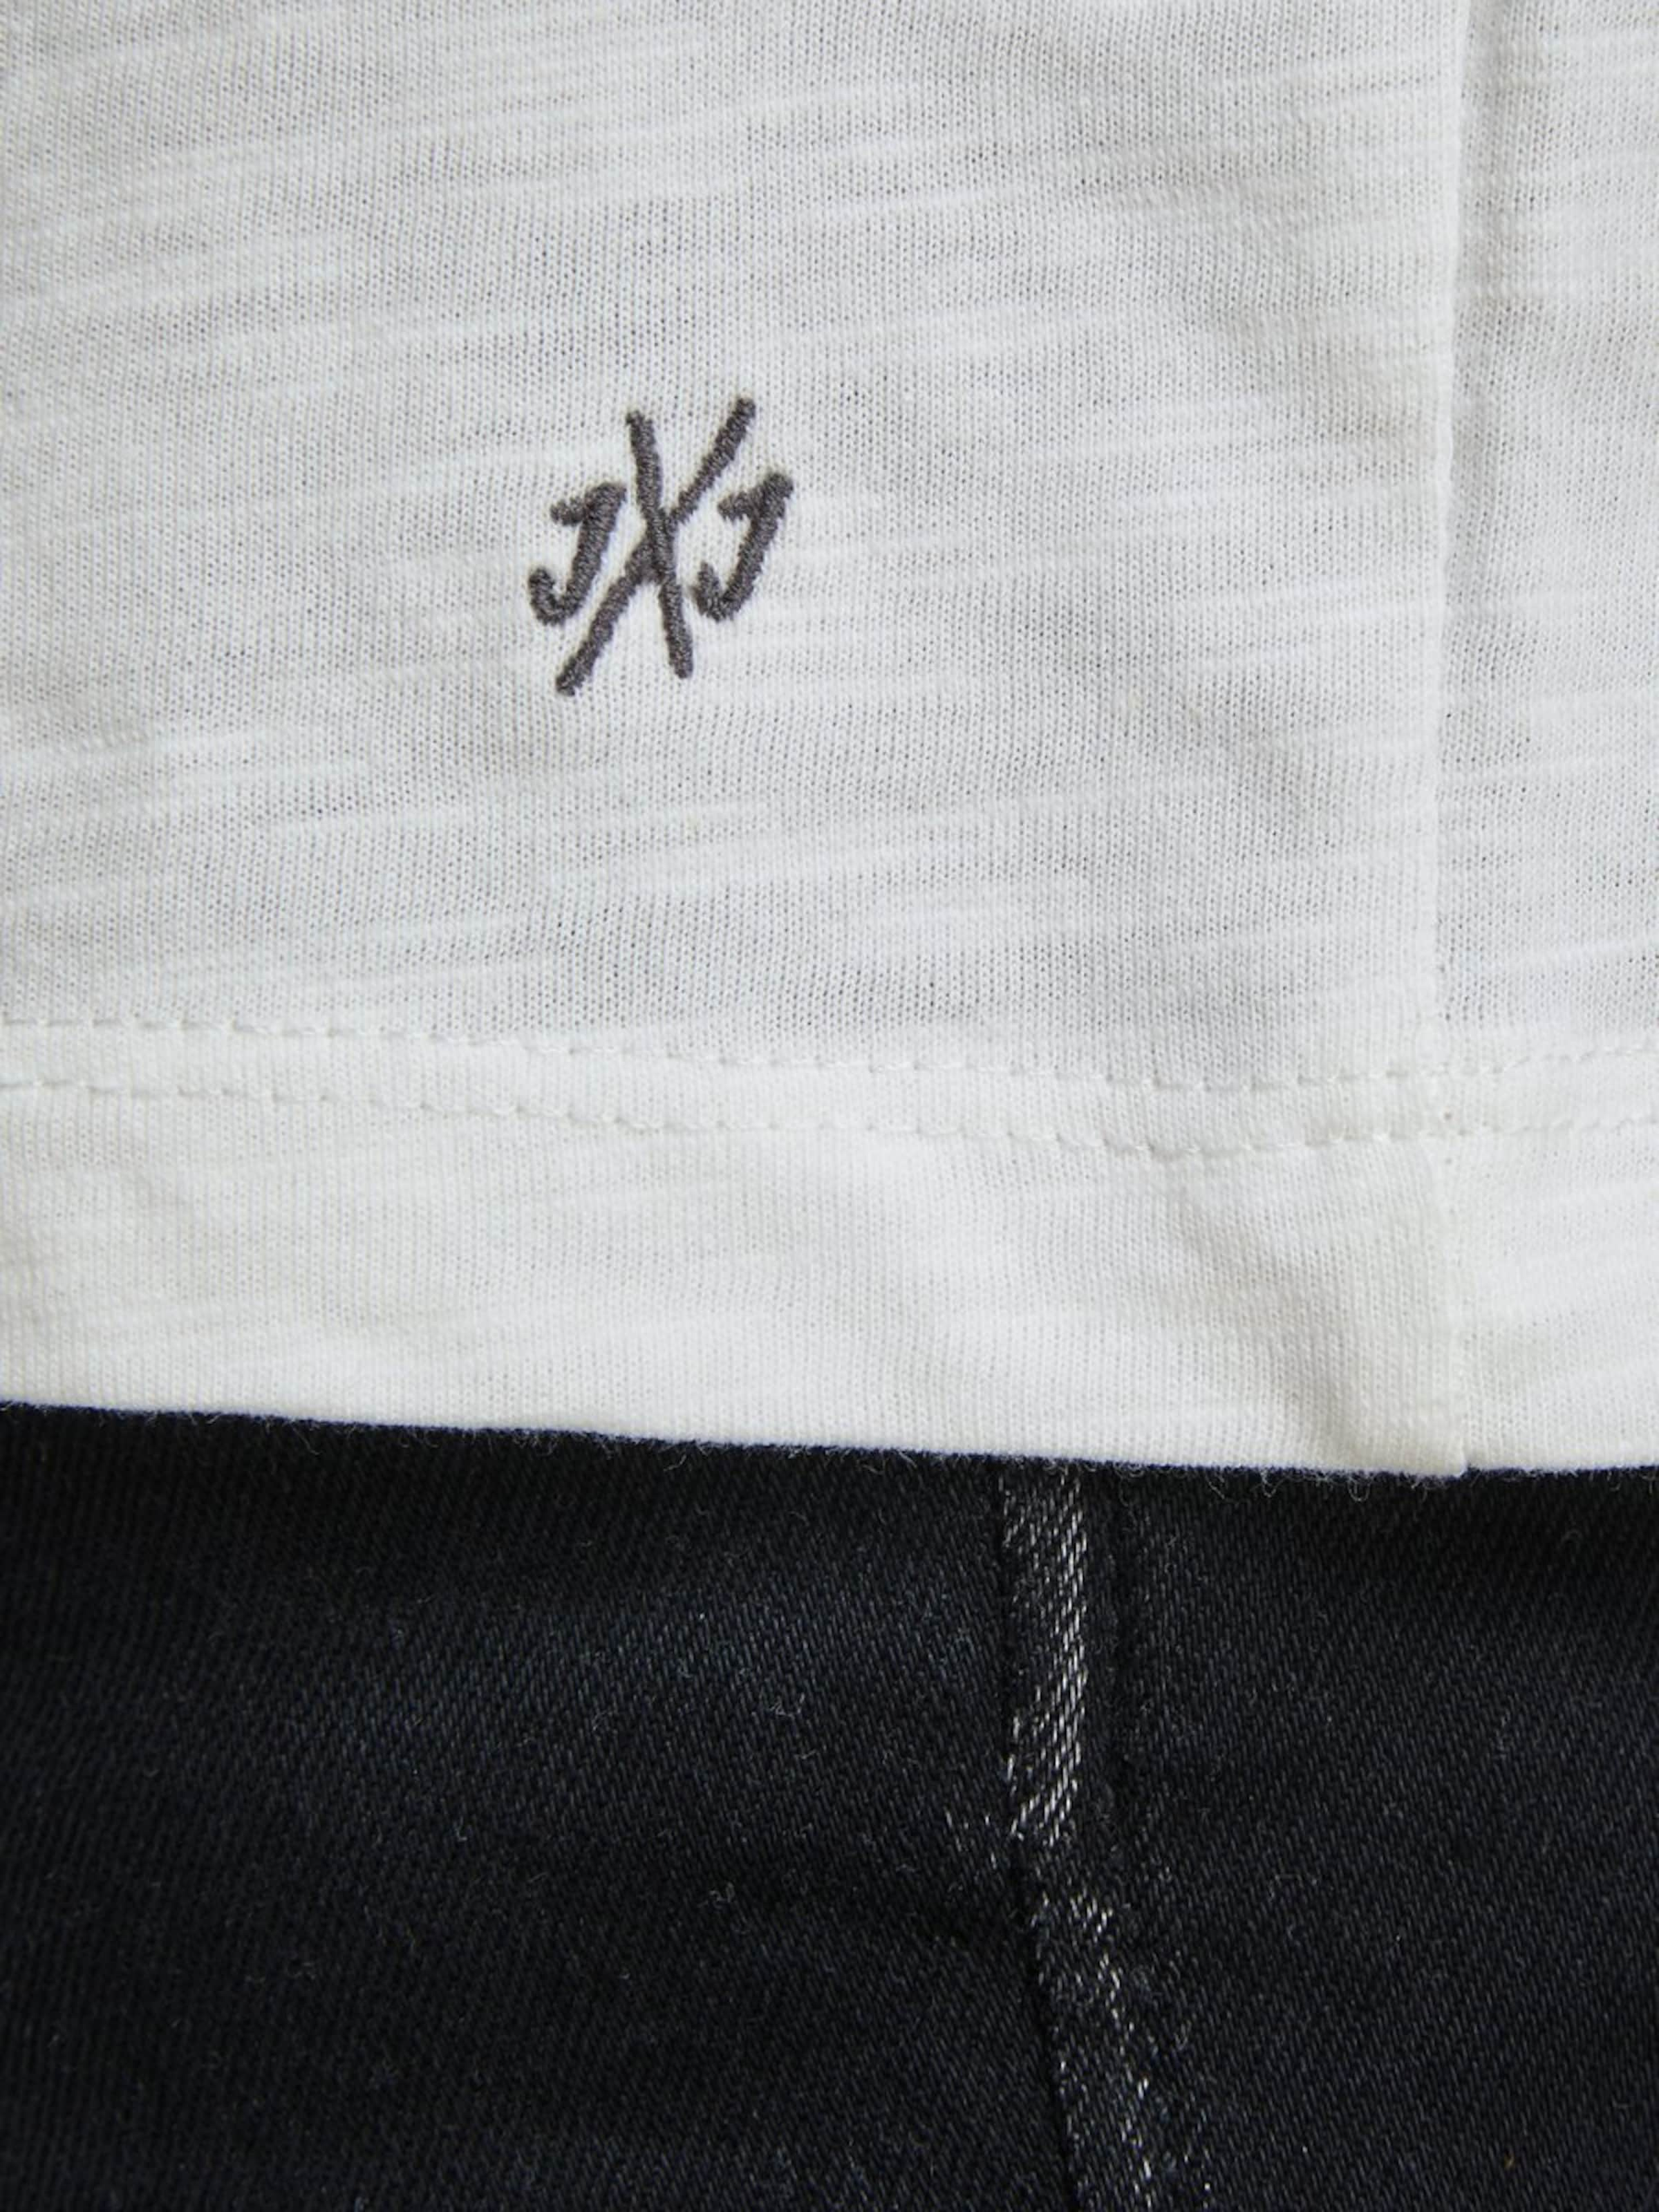 In In BasaltgrauHellgrau In Jackamp; Jones Jones Jackamp; Jones Jackamp; BasaltgrauHellgrau Shirt Shirt Shirt 7g6Yybf